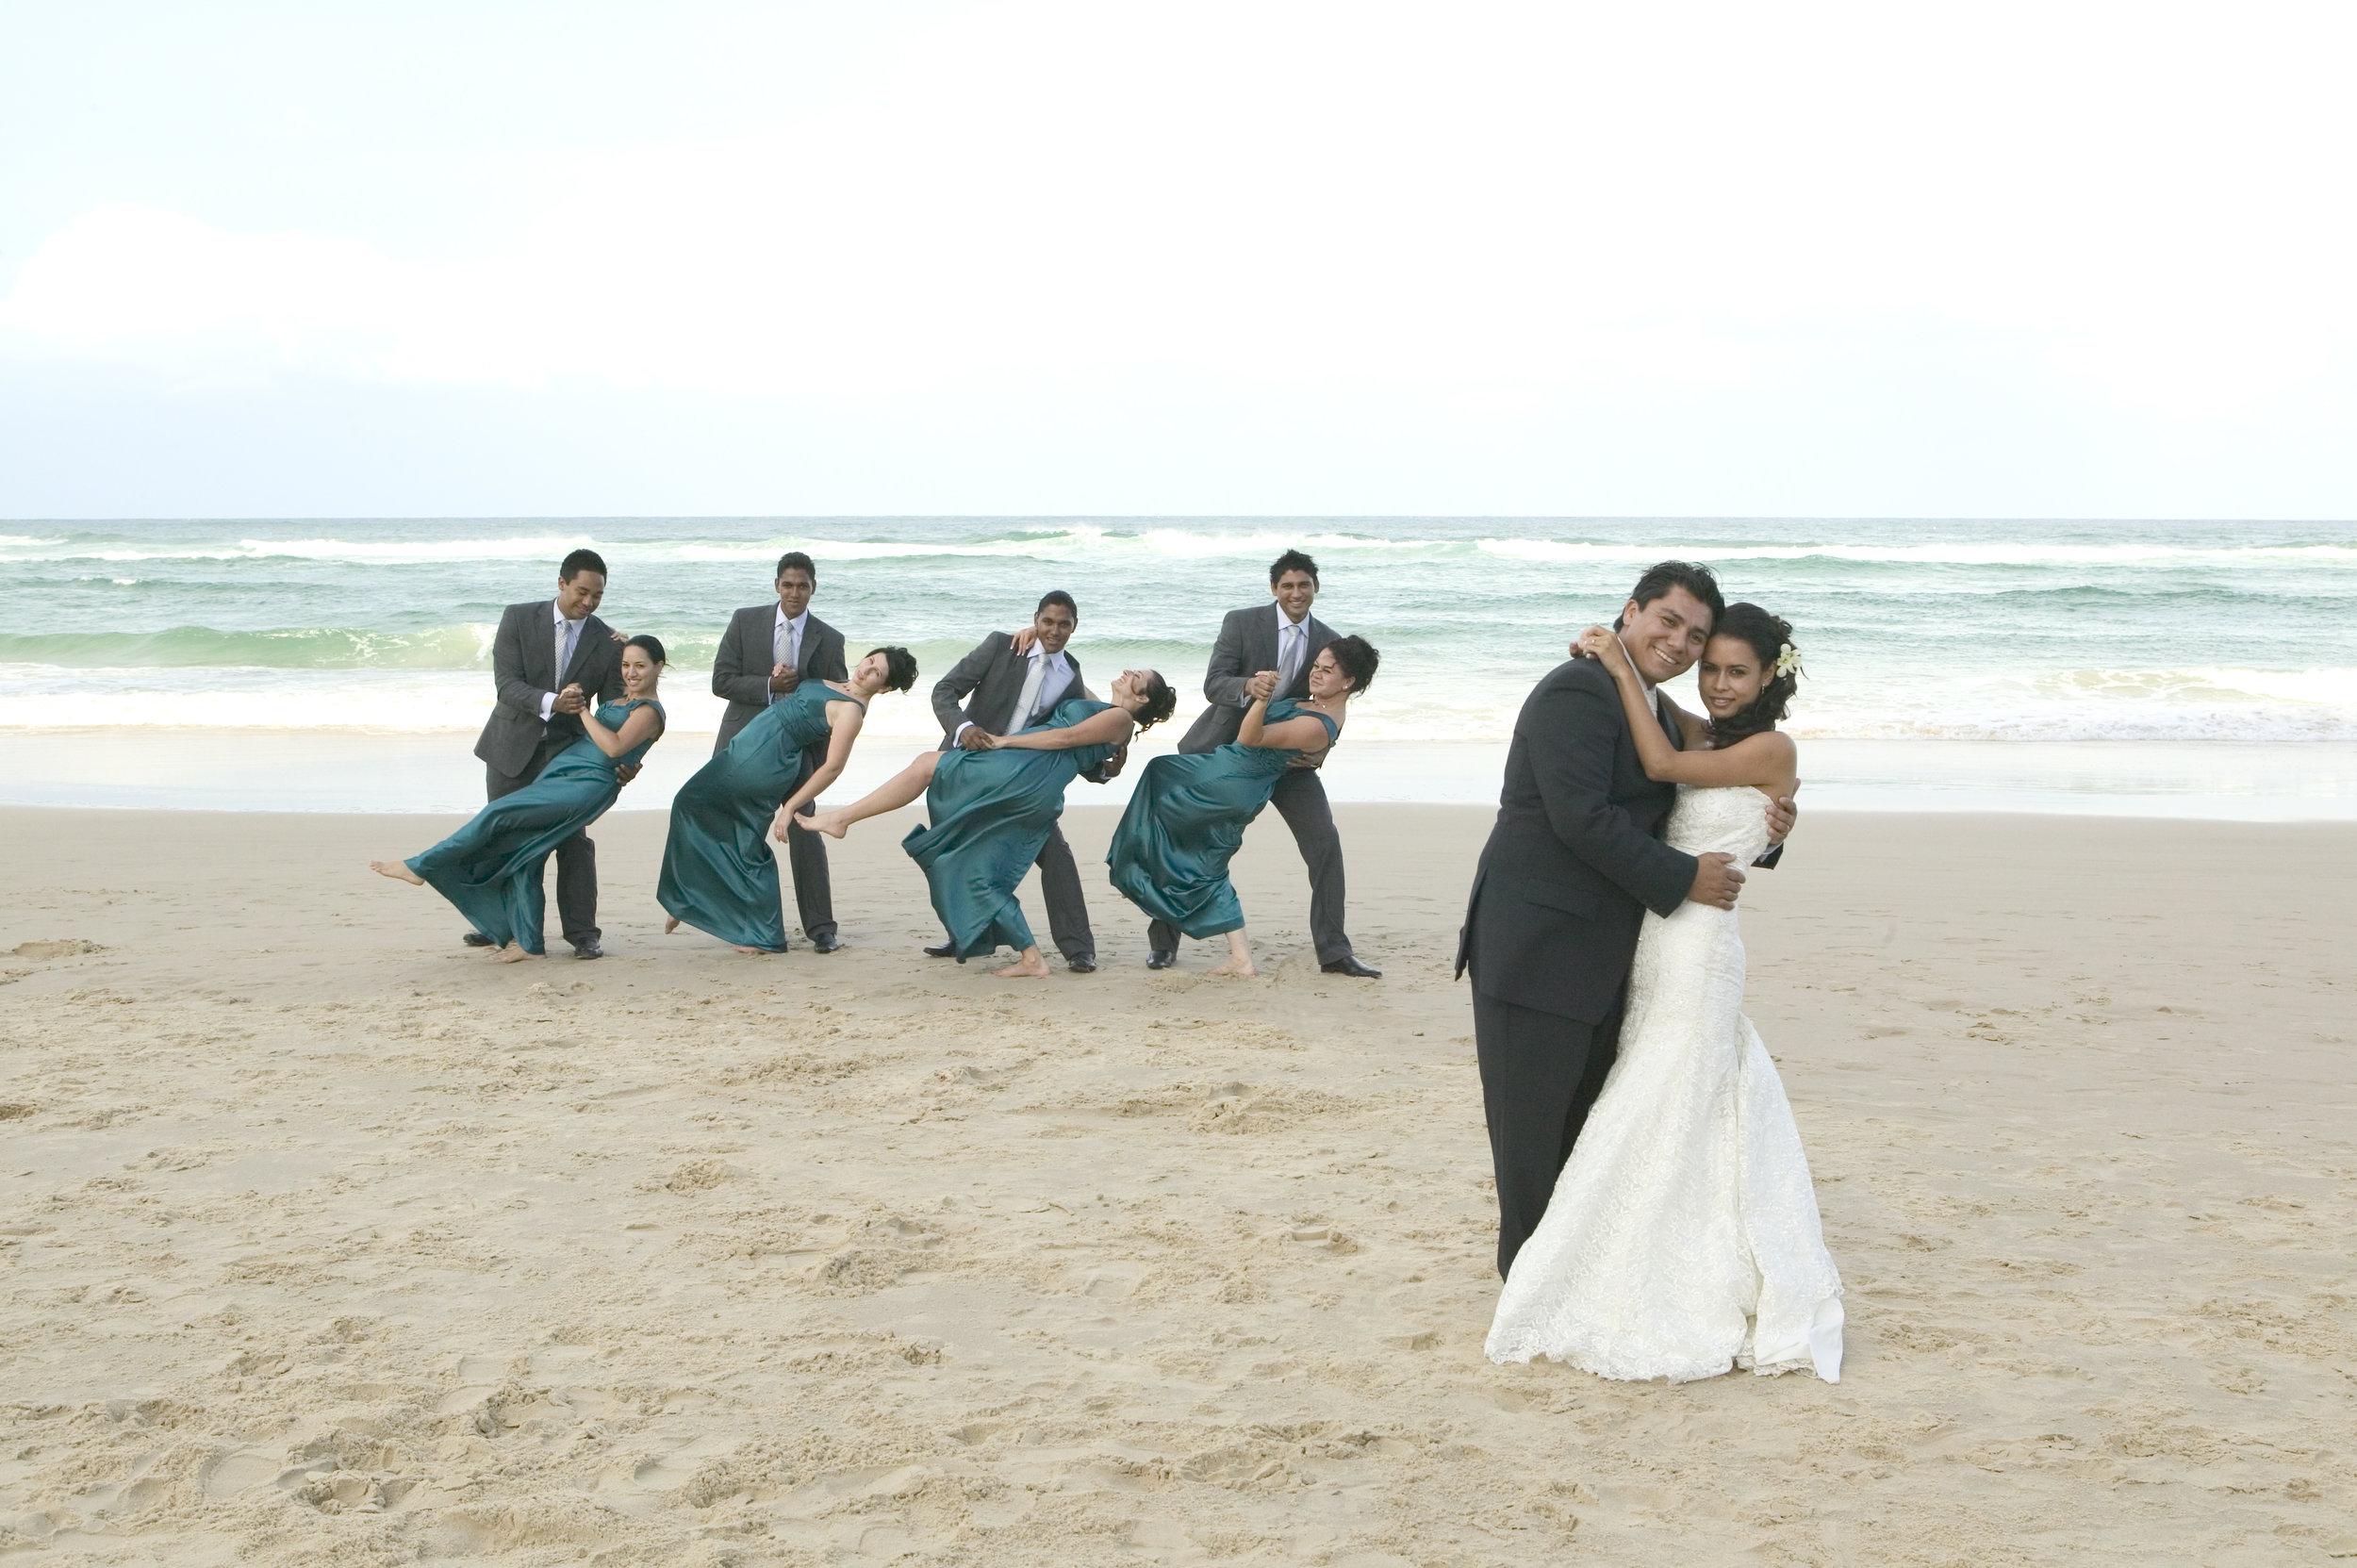 ultrapix-wedding-photographer-adelaide-sydney